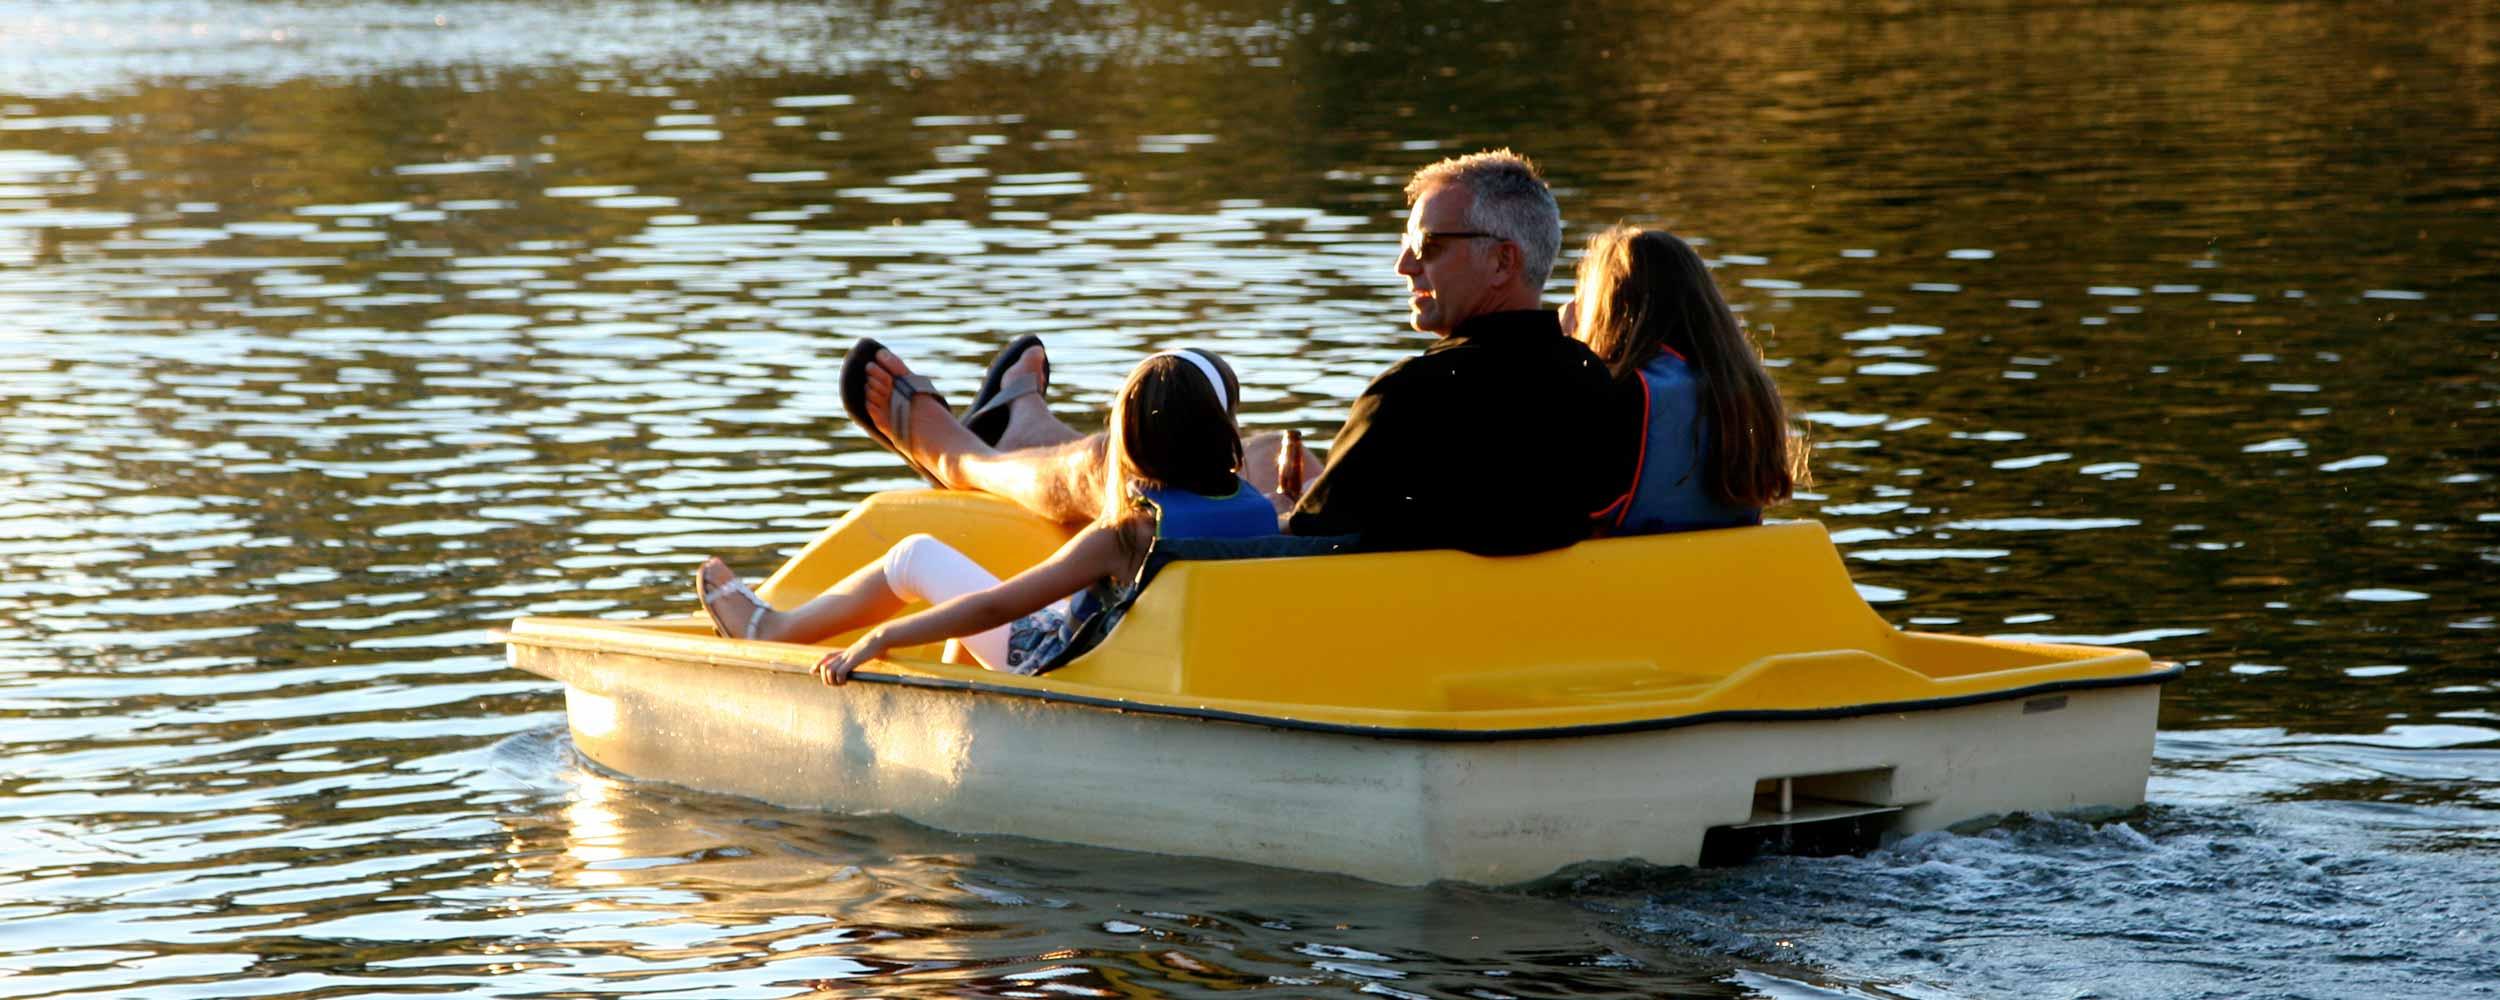 Paddle Boating on Alisal Lake - Alisal Resort in Solvang California